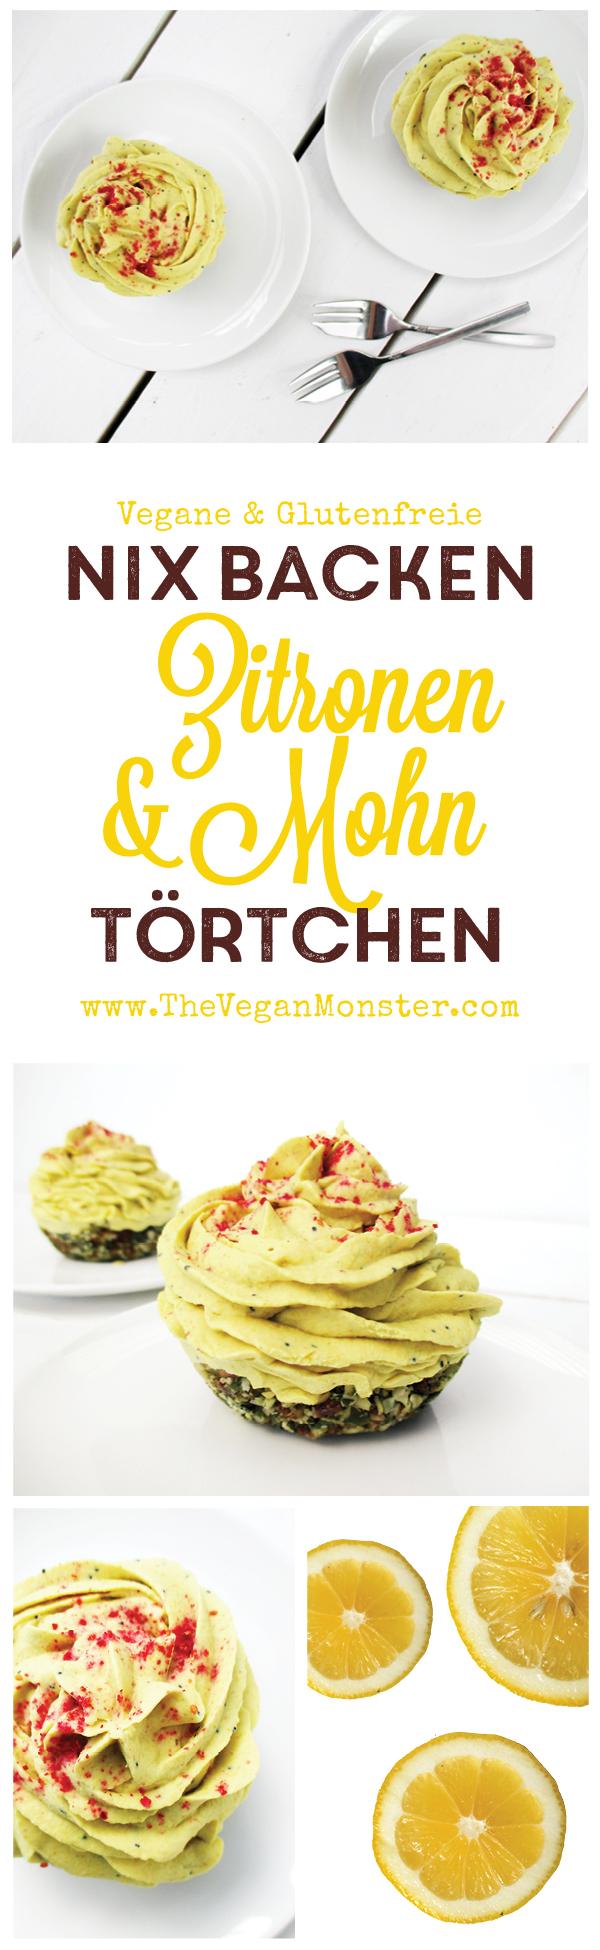 Nix Backen Vegane Glutenfreie Milchfreie Zitronen Mohn Toertchen Rezept